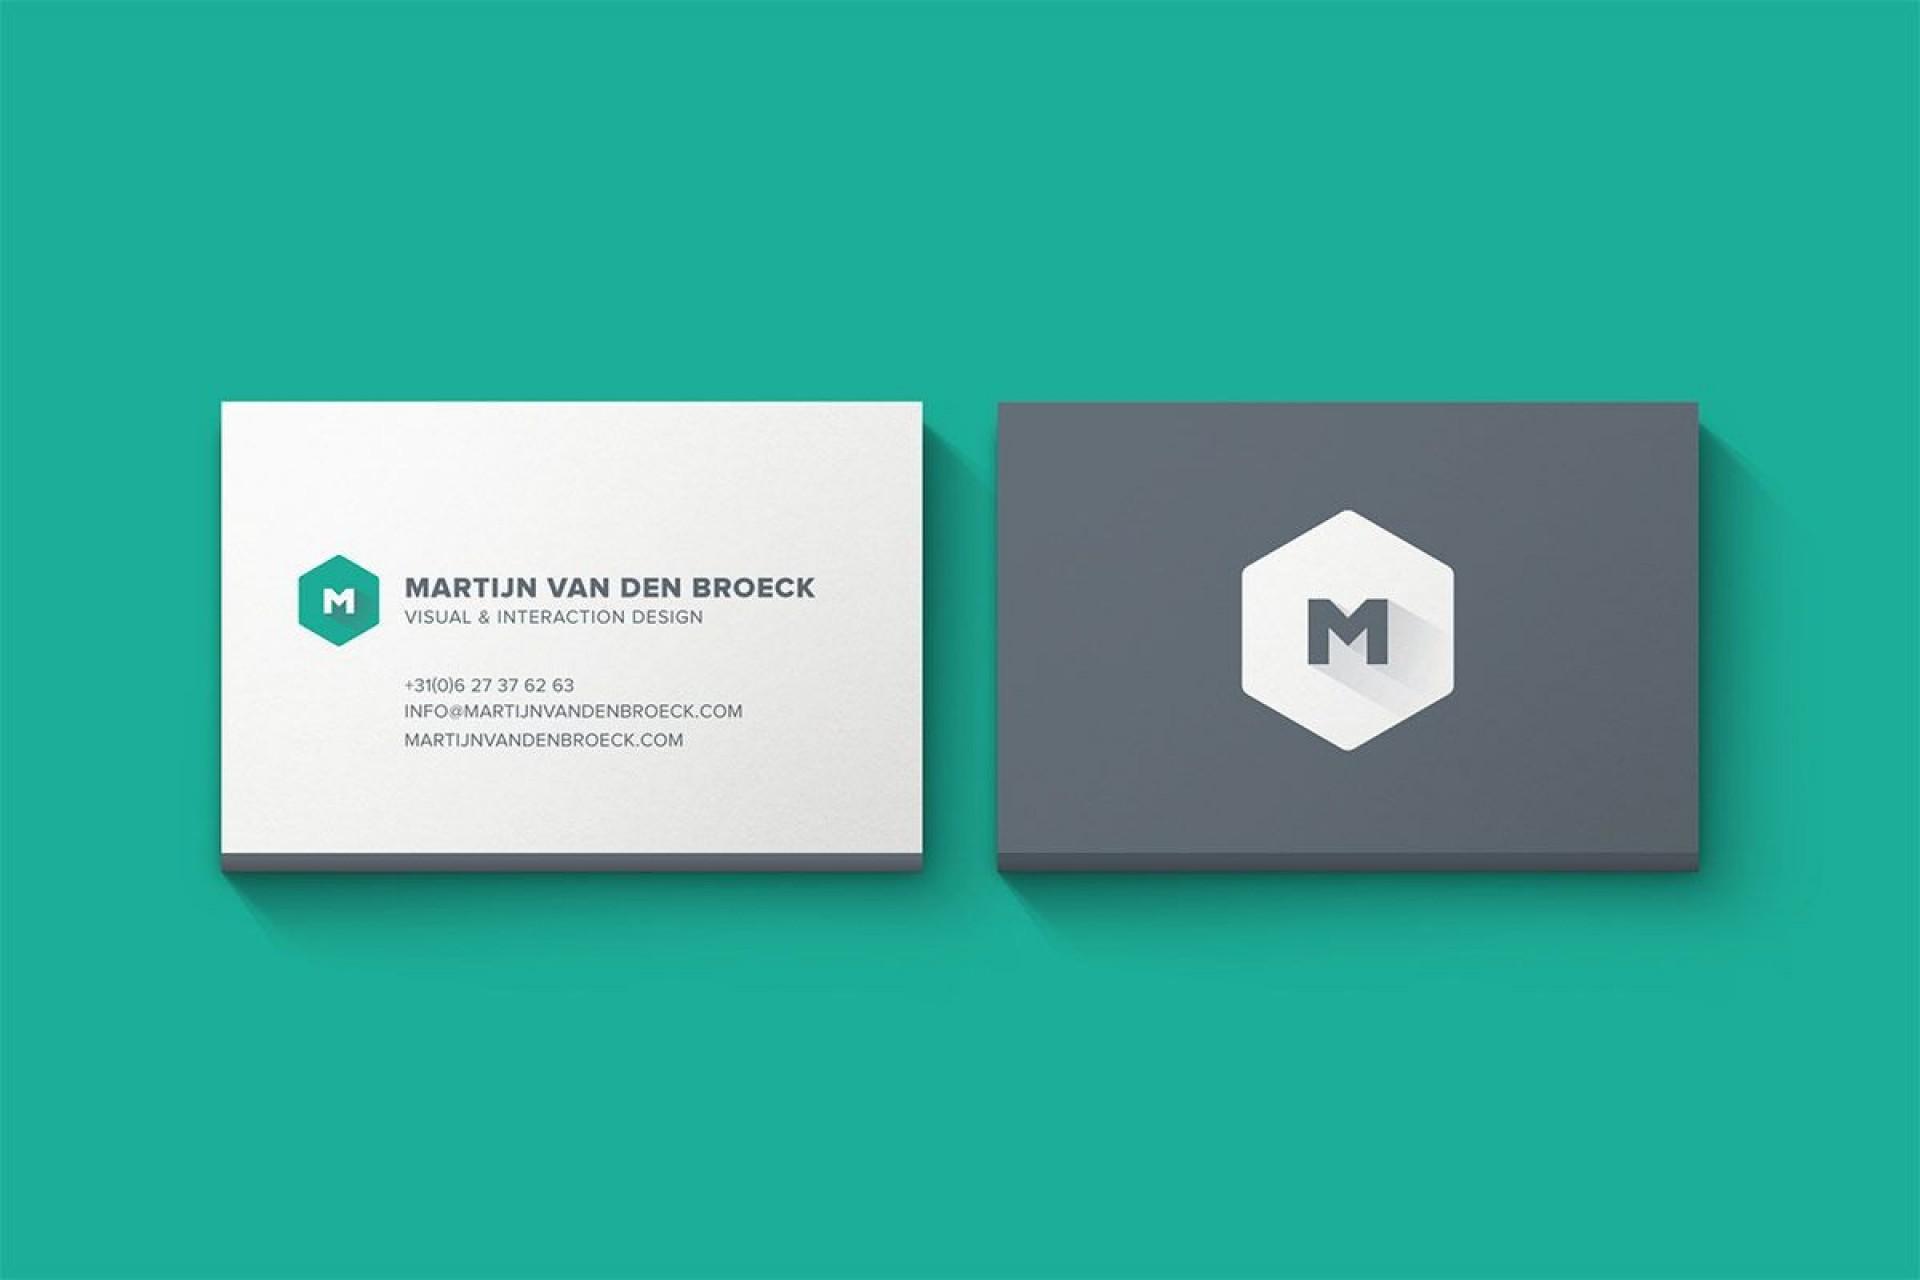 004 Magnificent Minimal Busines Card Template Free Download Design  Simple Coreldraw1920